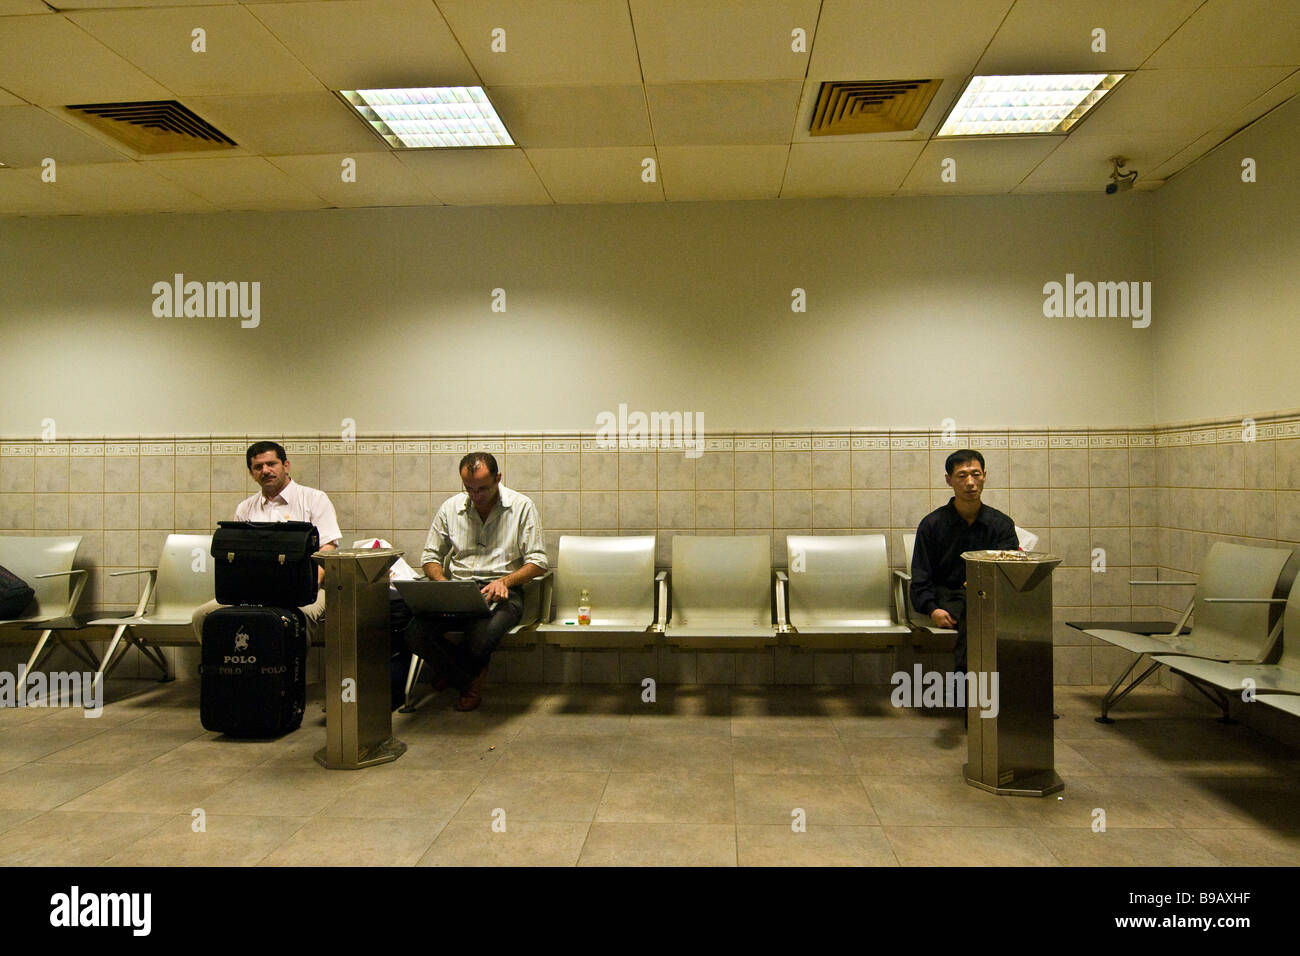 Aéroport de Doha Banque D'Images